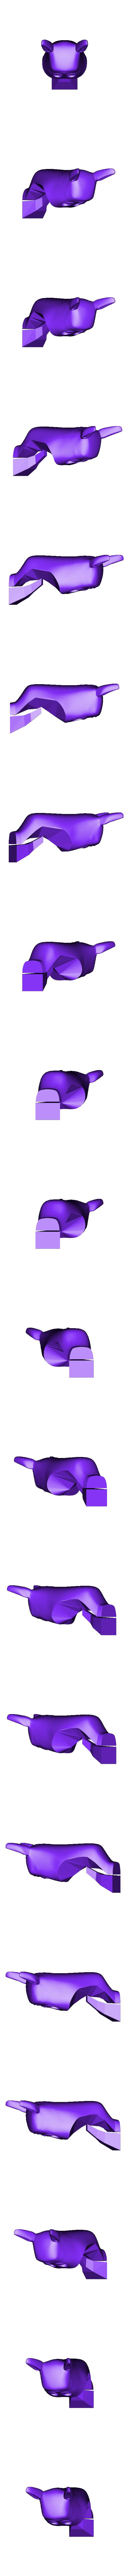 head_with_brace.stl Download free STL file Astro Jetson • 3D print model, reddadsteve